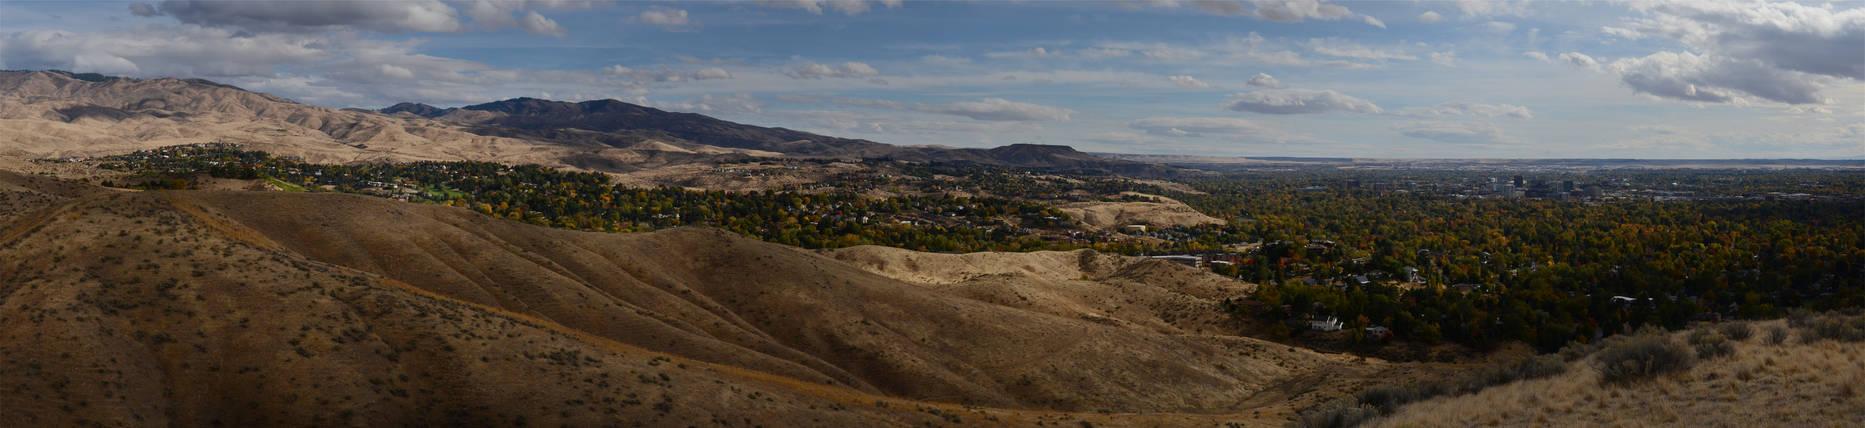 Boise Foothills Fall 2012-10-20